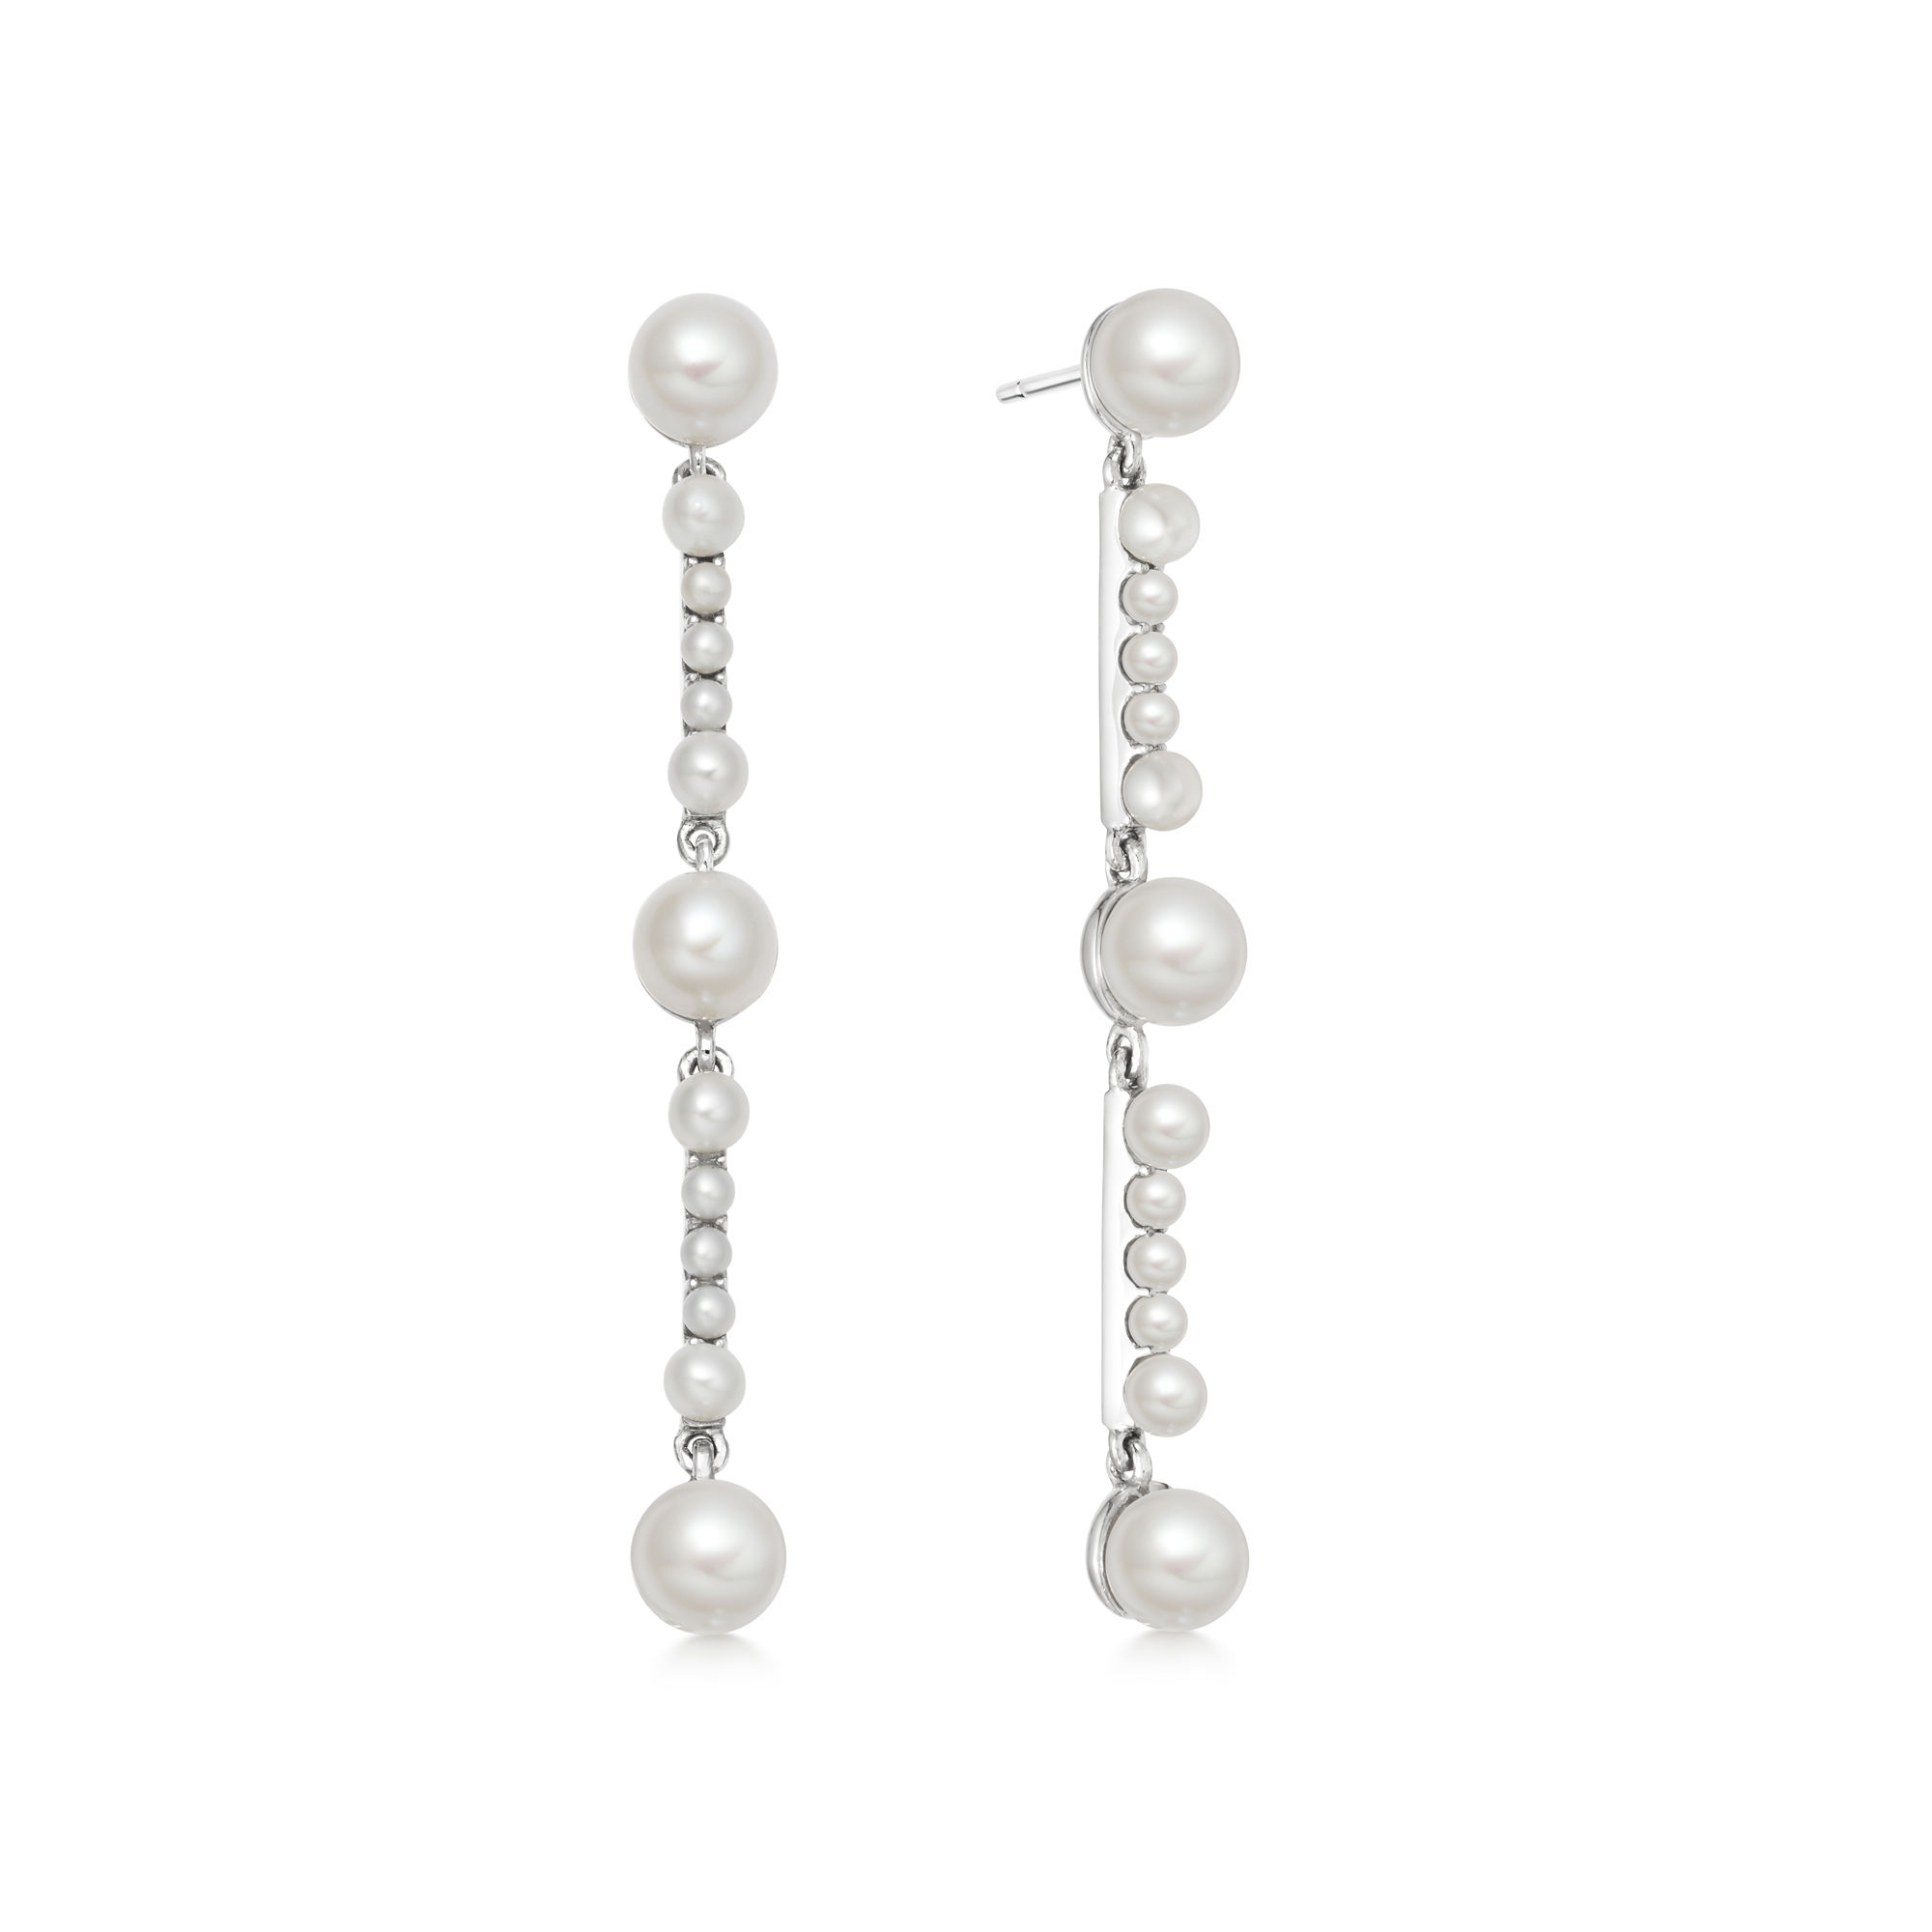 Orbs Pearl & Sterling Silver Drop Earrings, $250